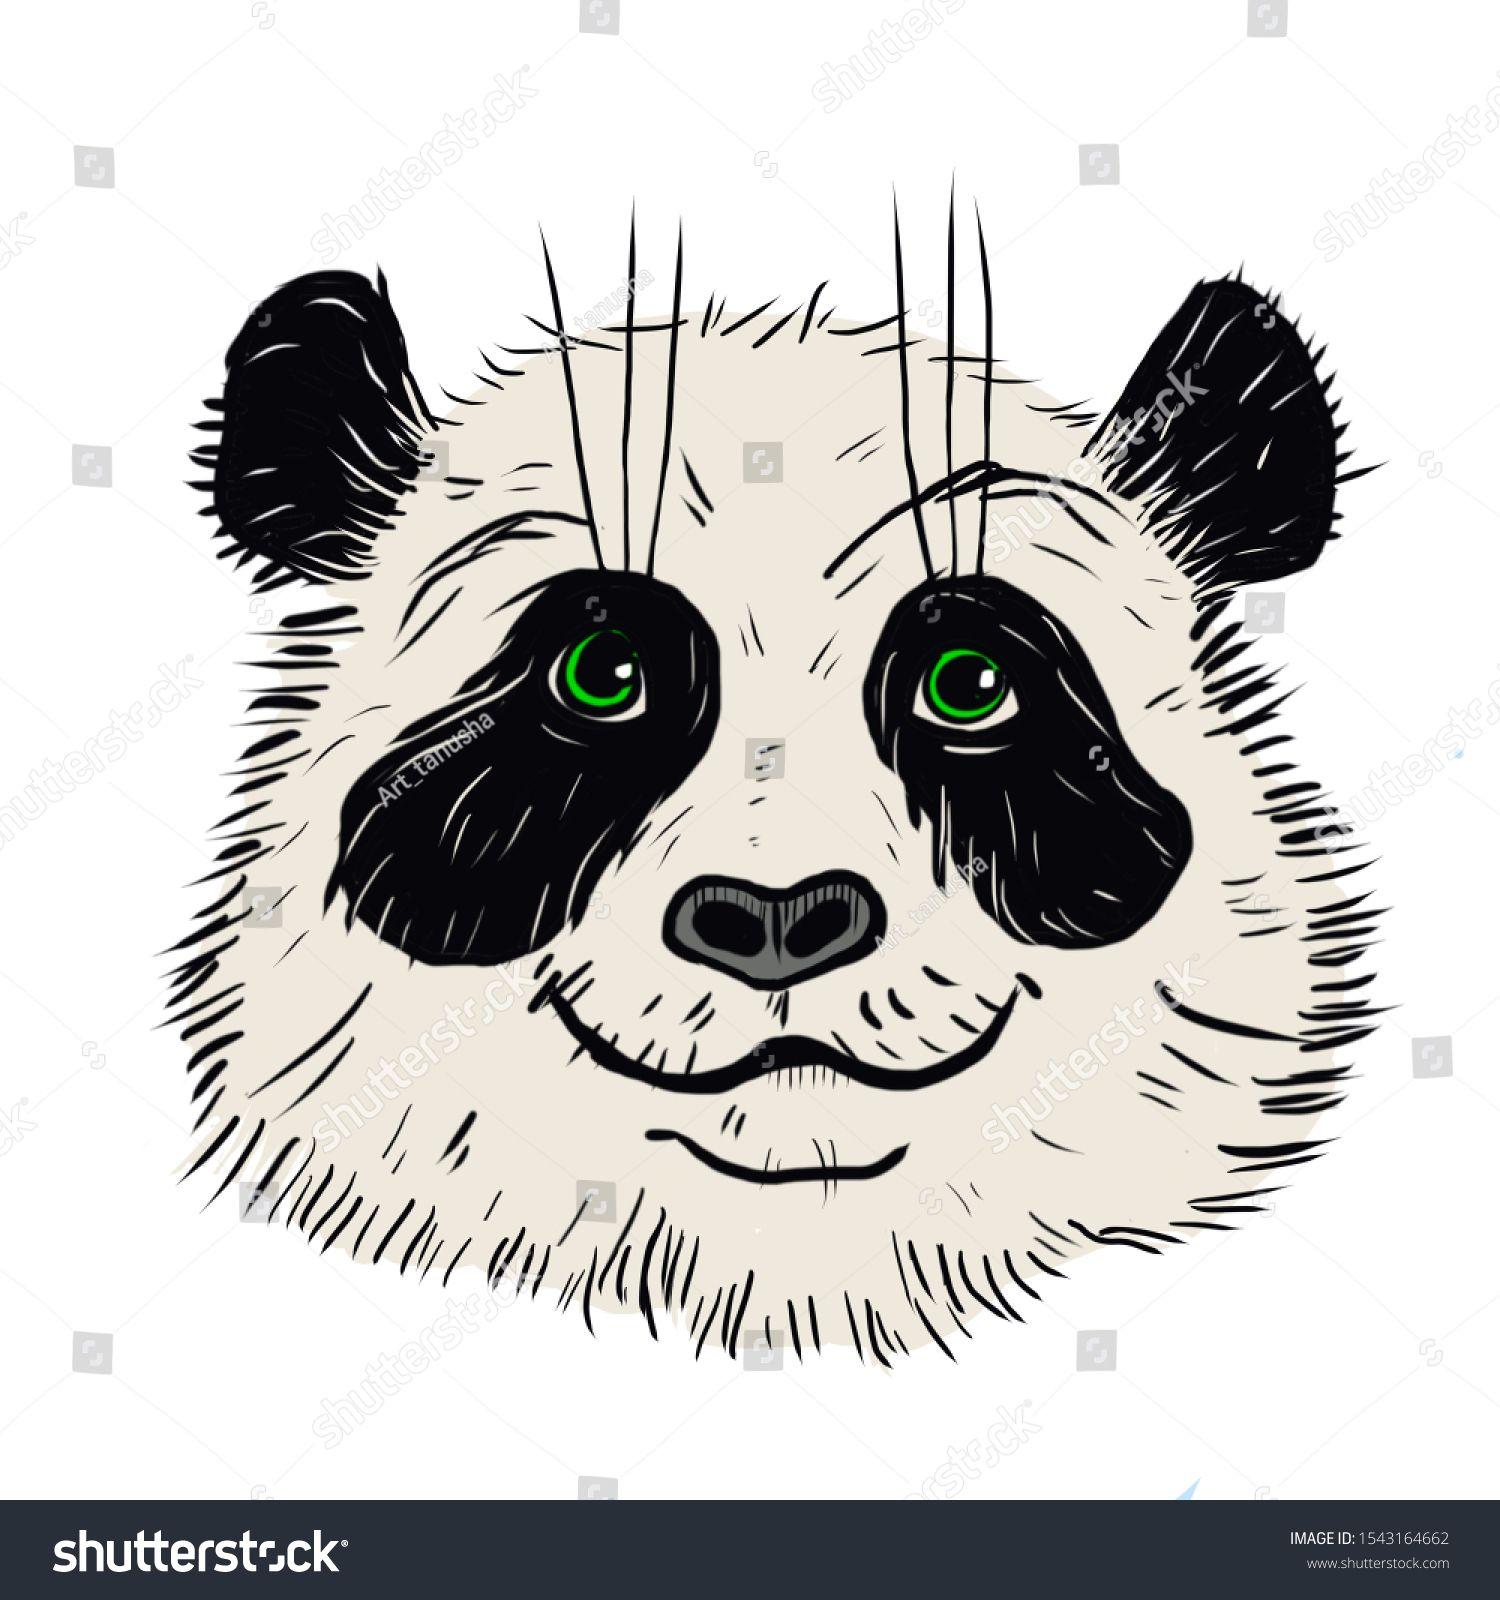 Panda Animal Cute Face Asian Panda Head Portrait Realistic Fur Bamboo Portrait Of A Funny Black And White Panda Animal Funny Animal Faces Animals Cute Faces